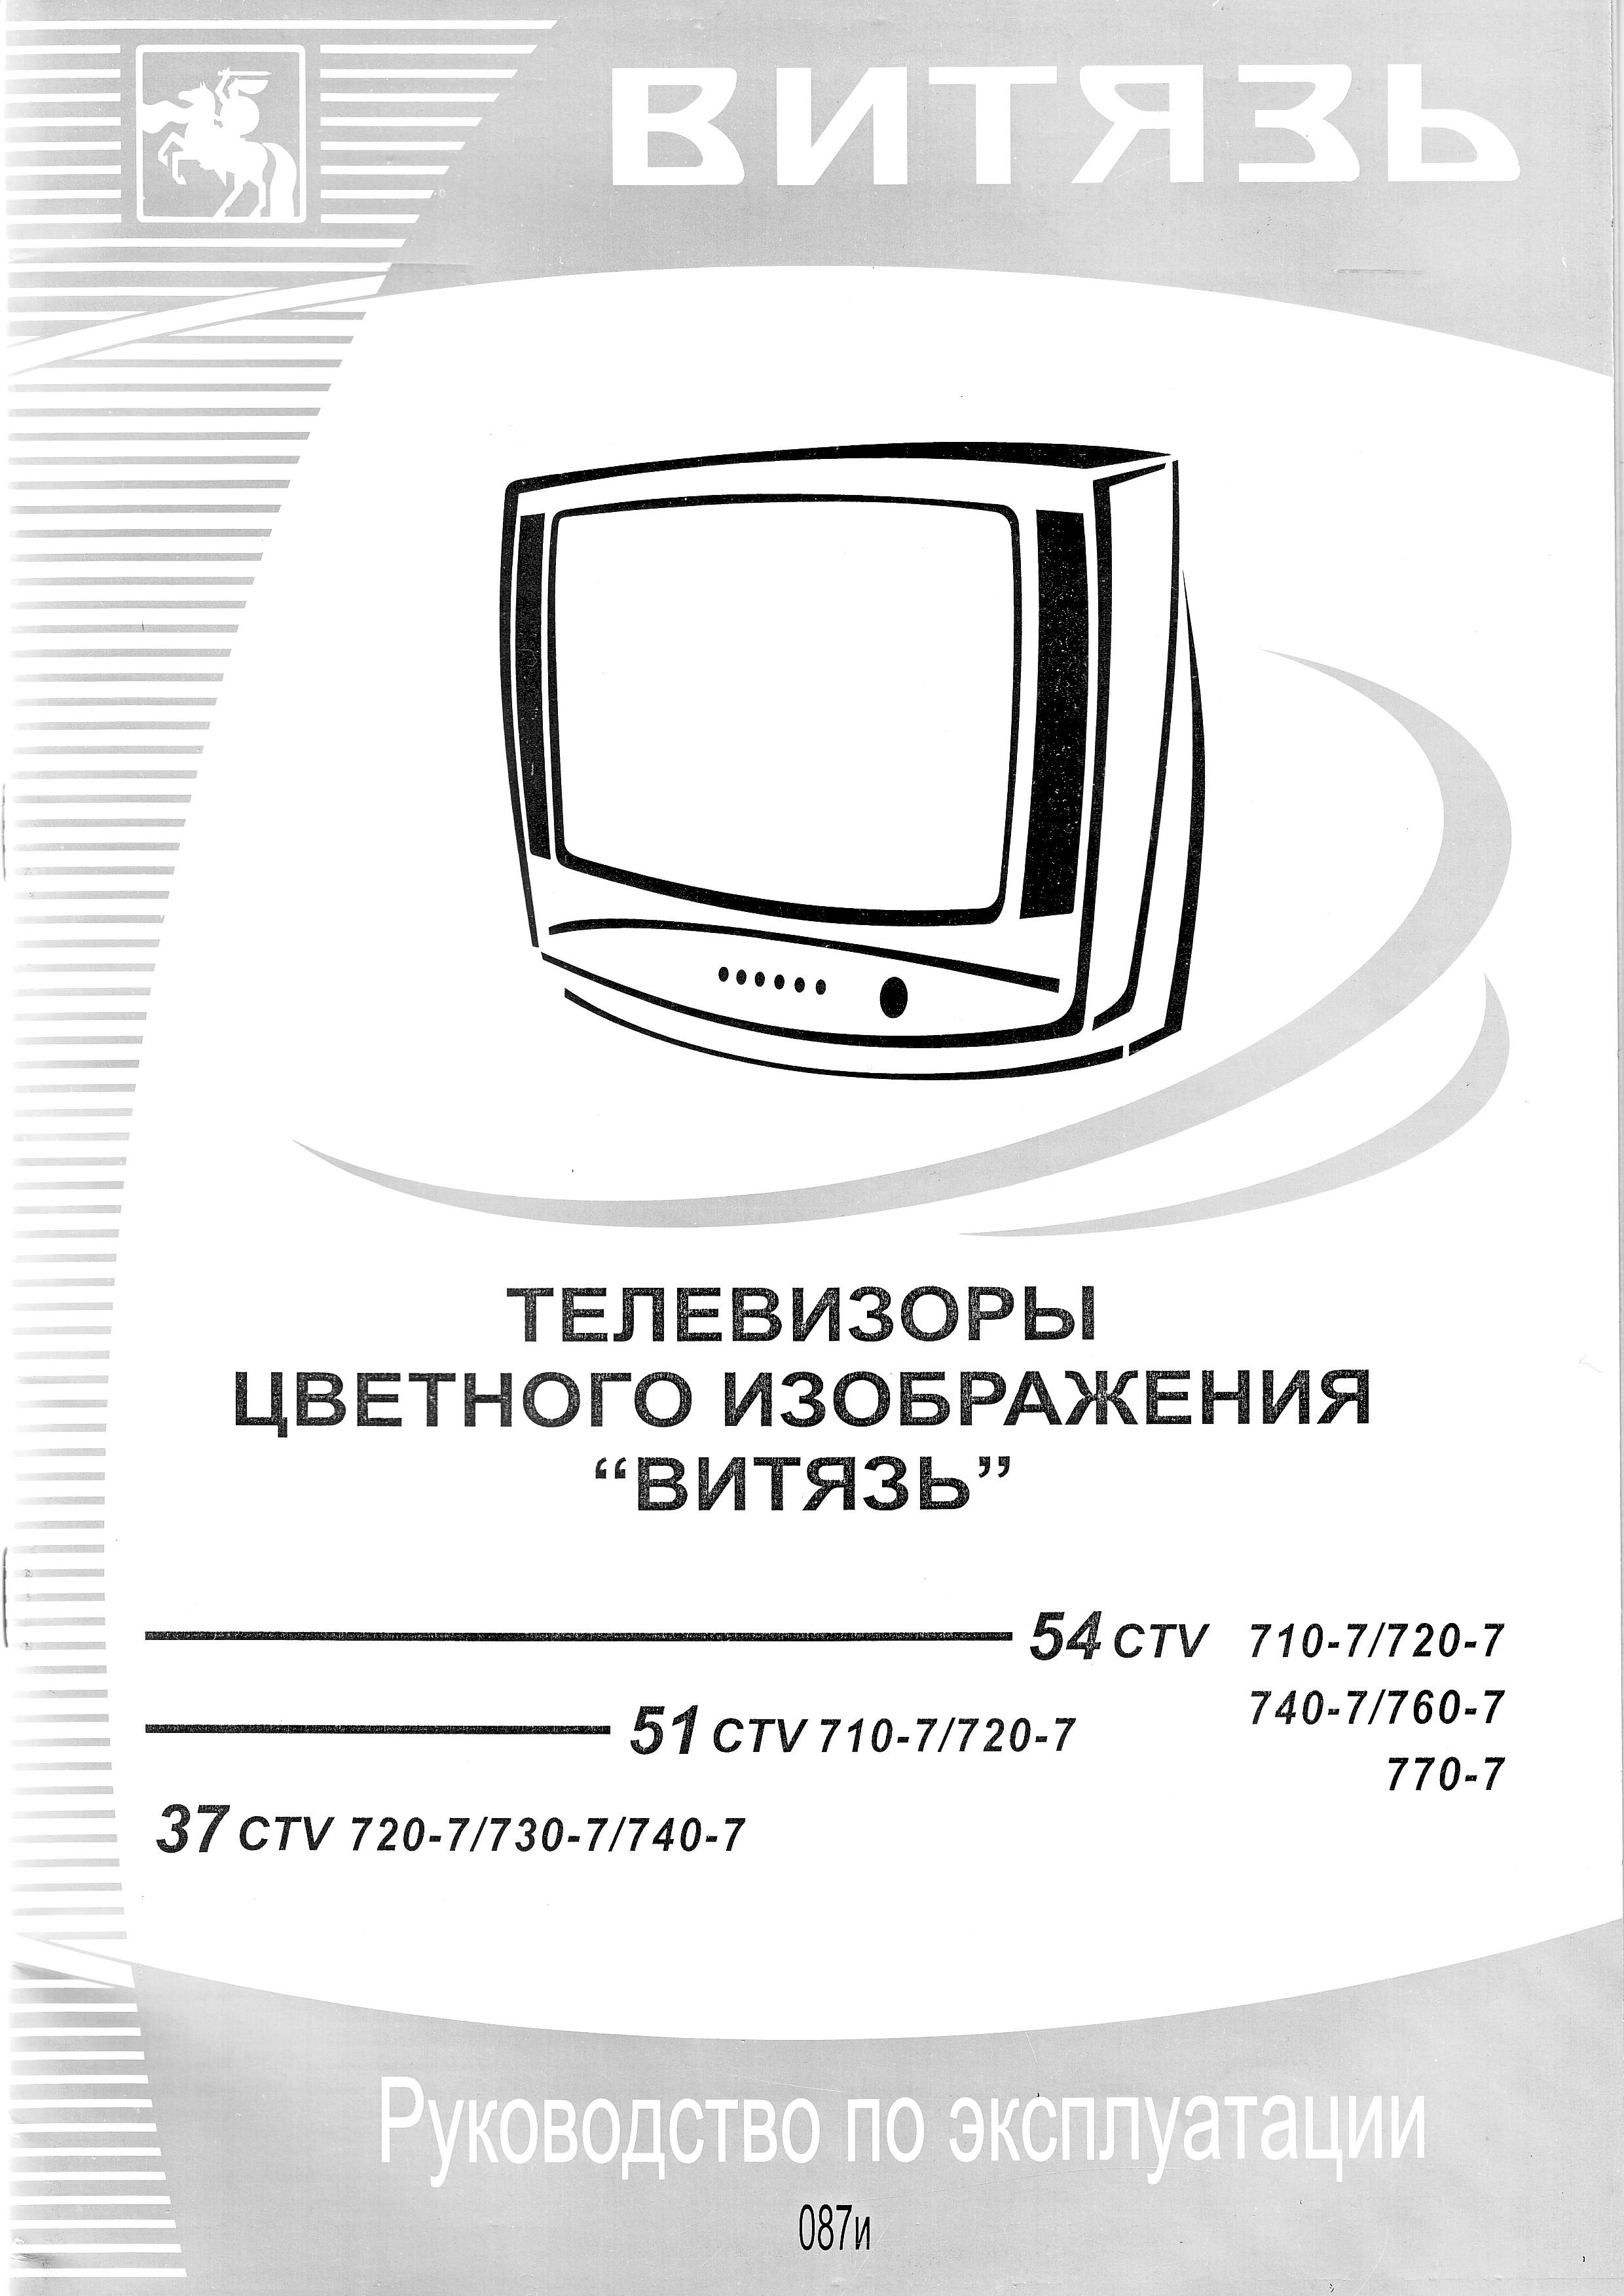 Инструкция телевизор витязь